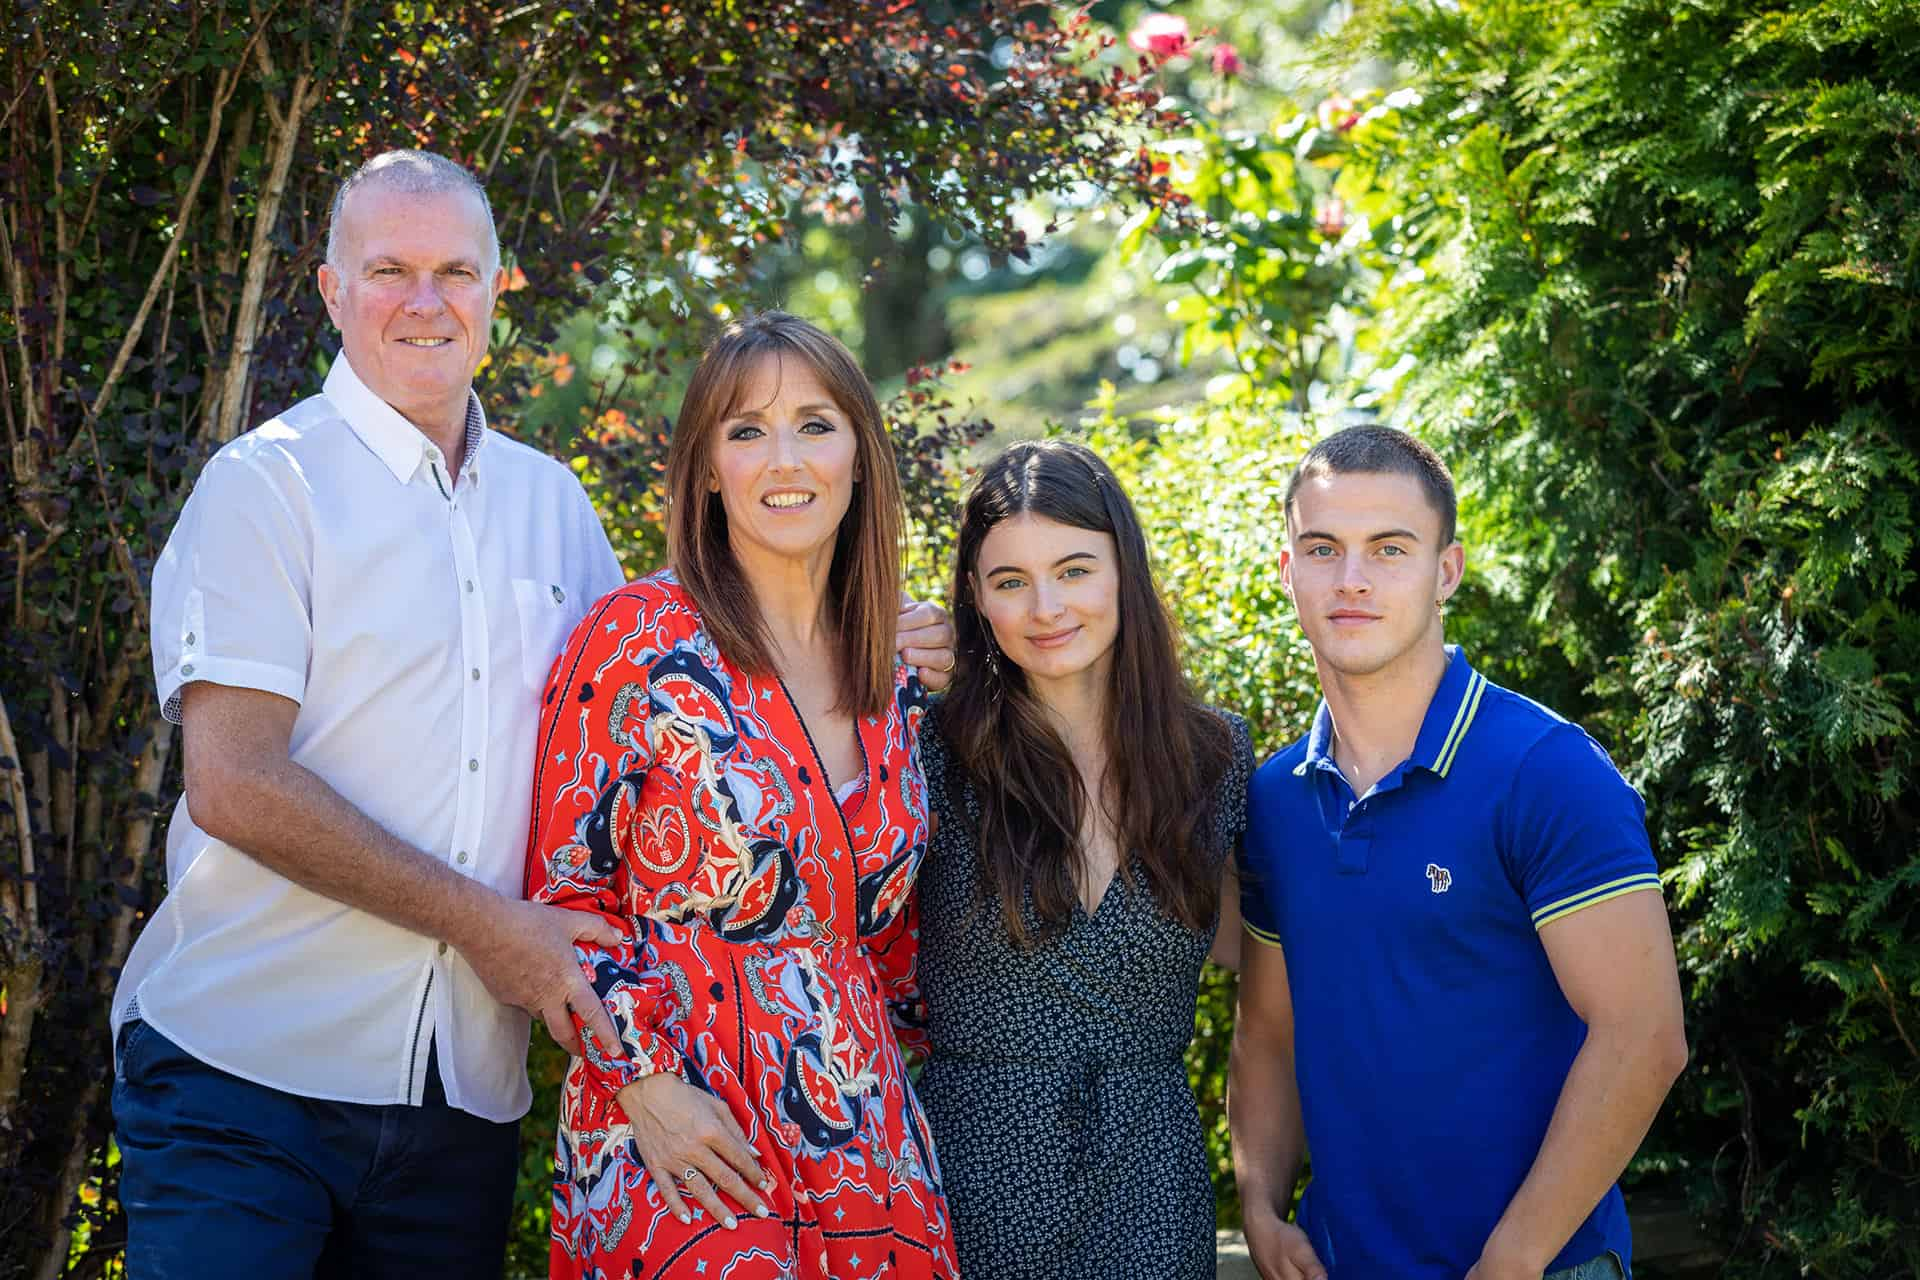 Family photographer Halifax, family photographer West Yorkshire